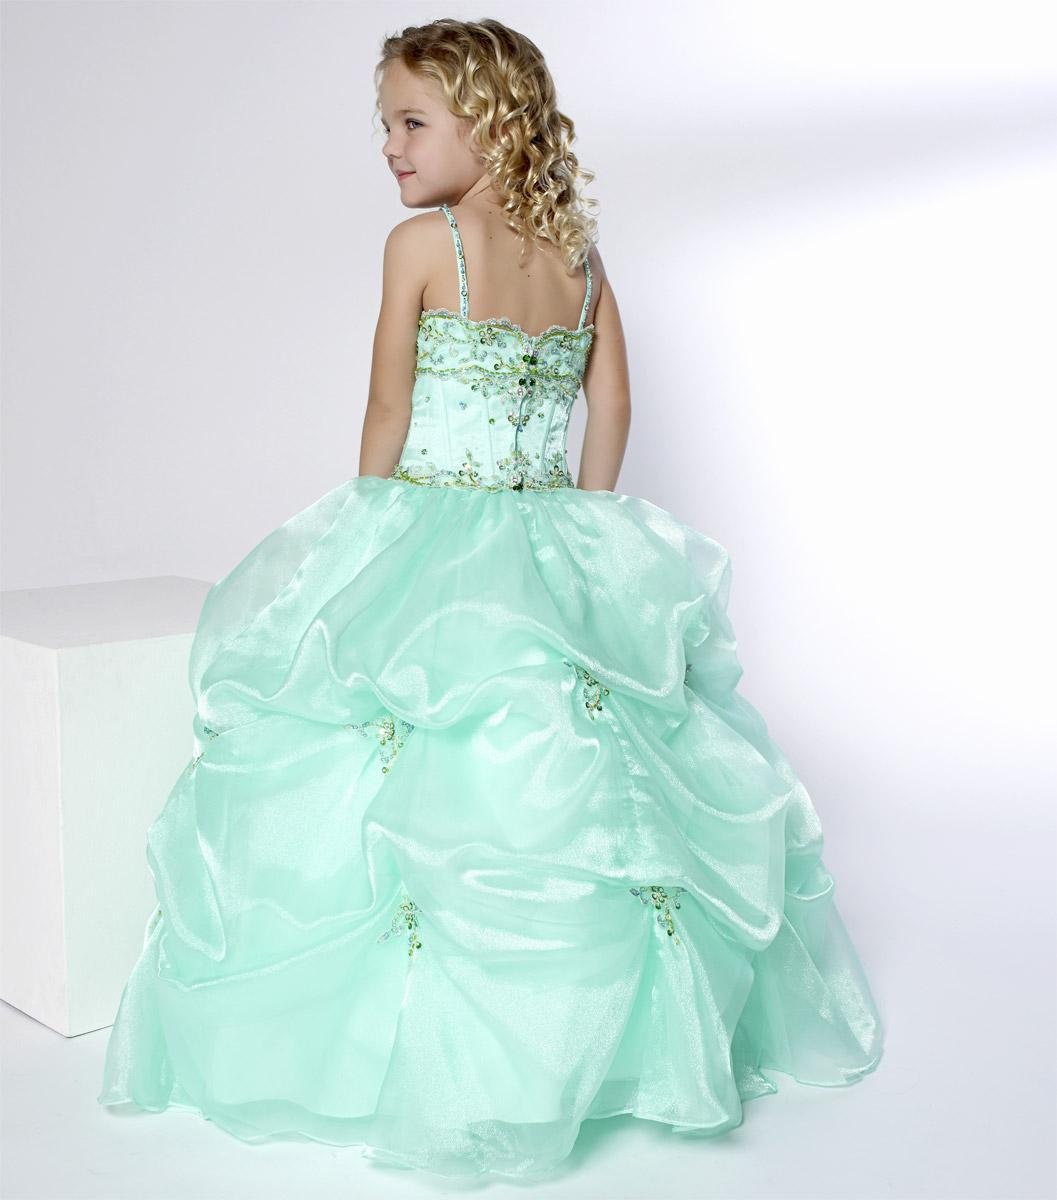 Christmas Green Organza Straps Beads Wedding Flower Girl Dress Girl's Skirt Birthday Pageant Dress Custom Size 2 4 6 8 10 12 F127003